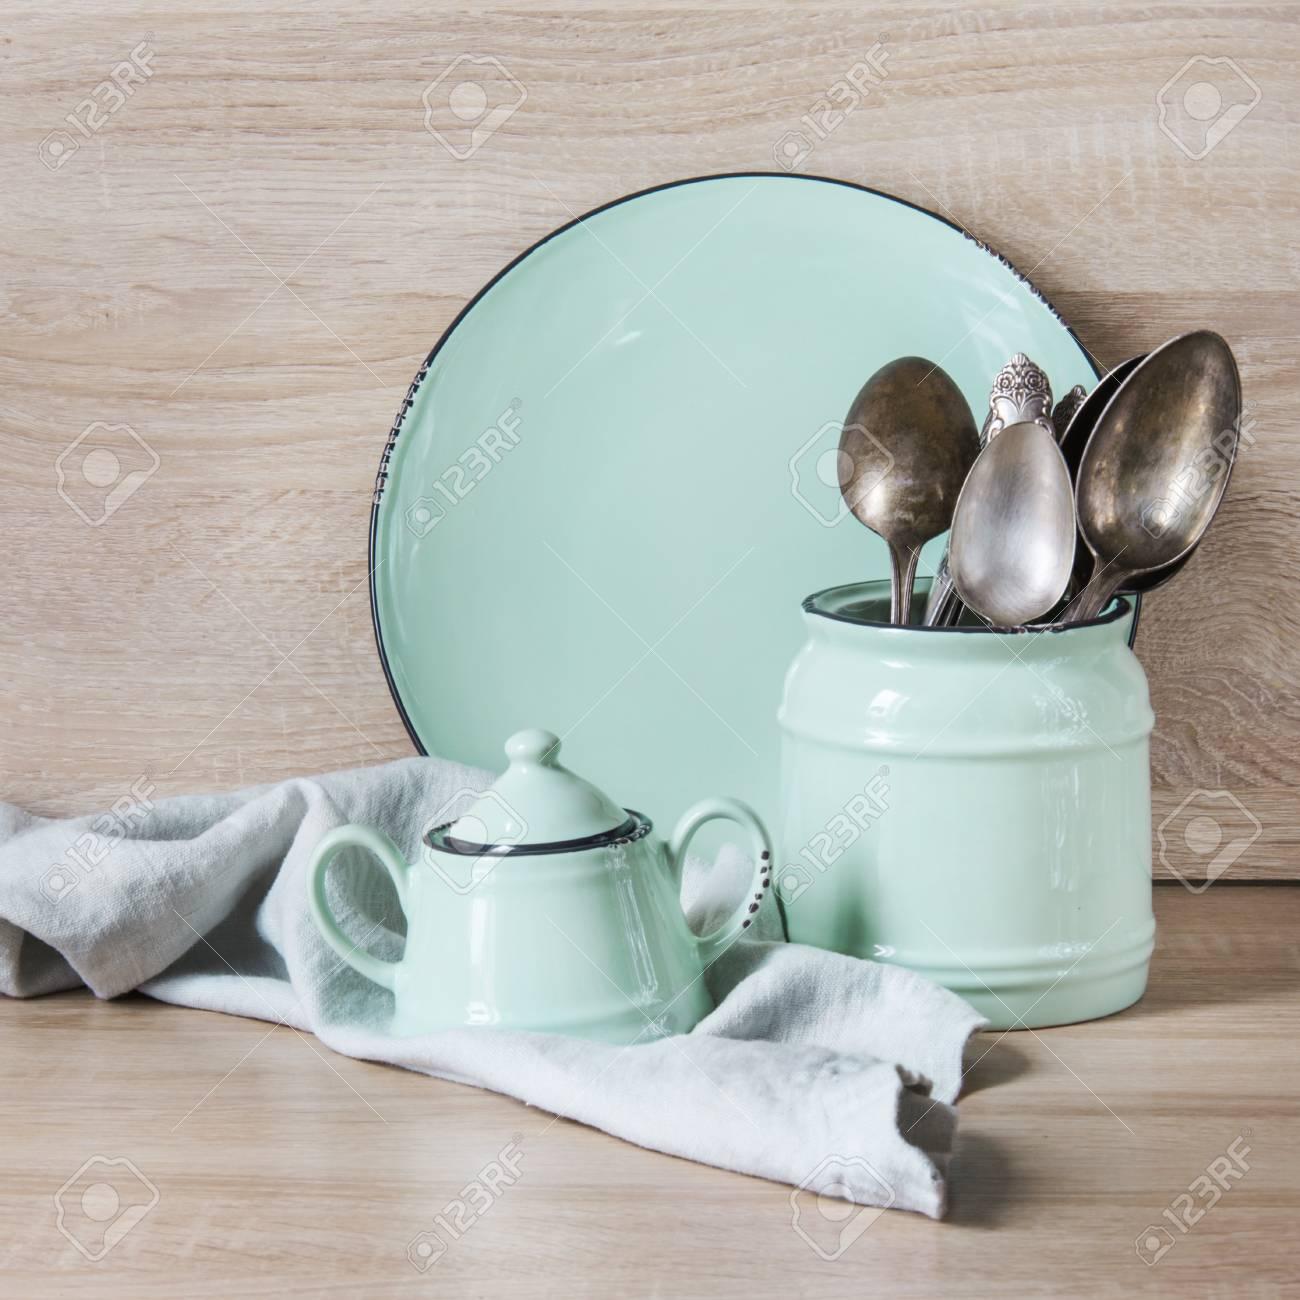 Turquoise Crockery Tableware Dishware Utensils And Stuff On